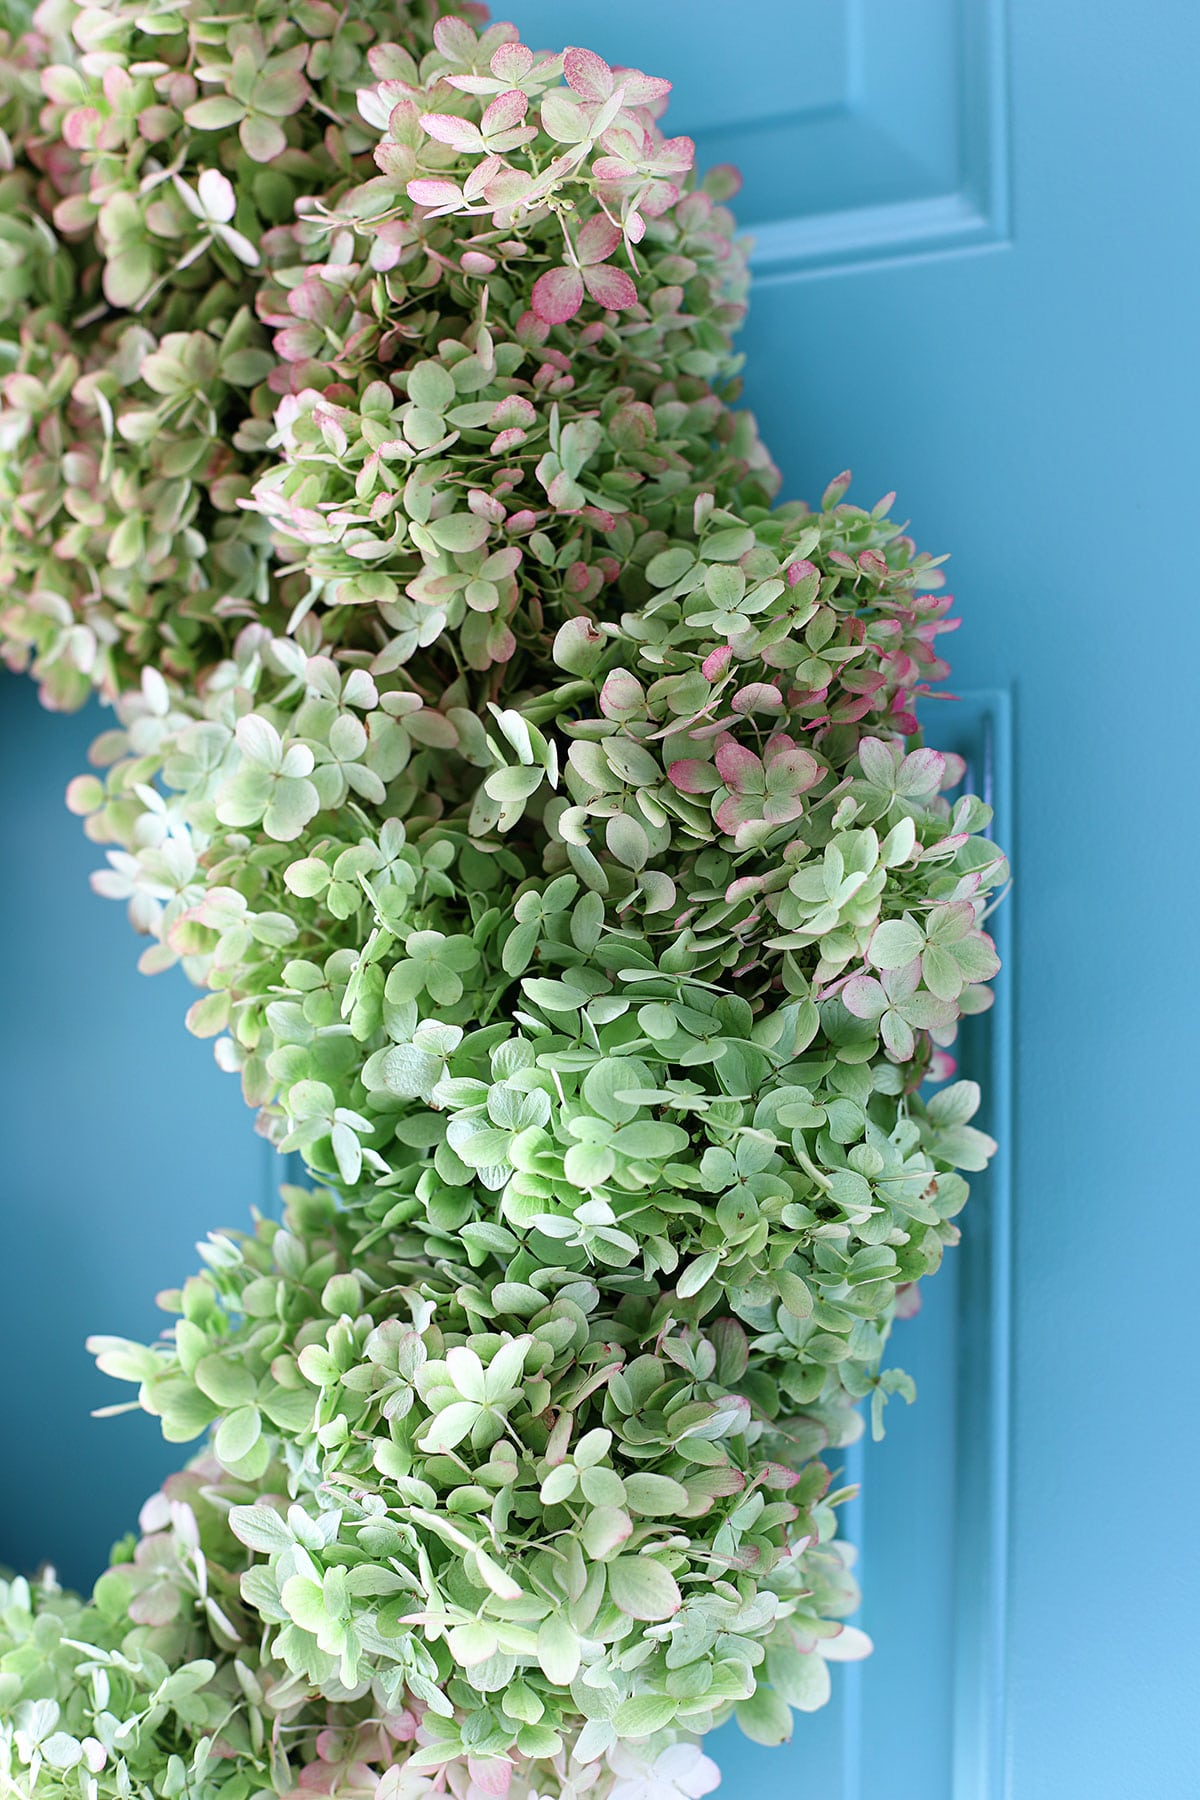 Limelight Hydrangea wreath close up